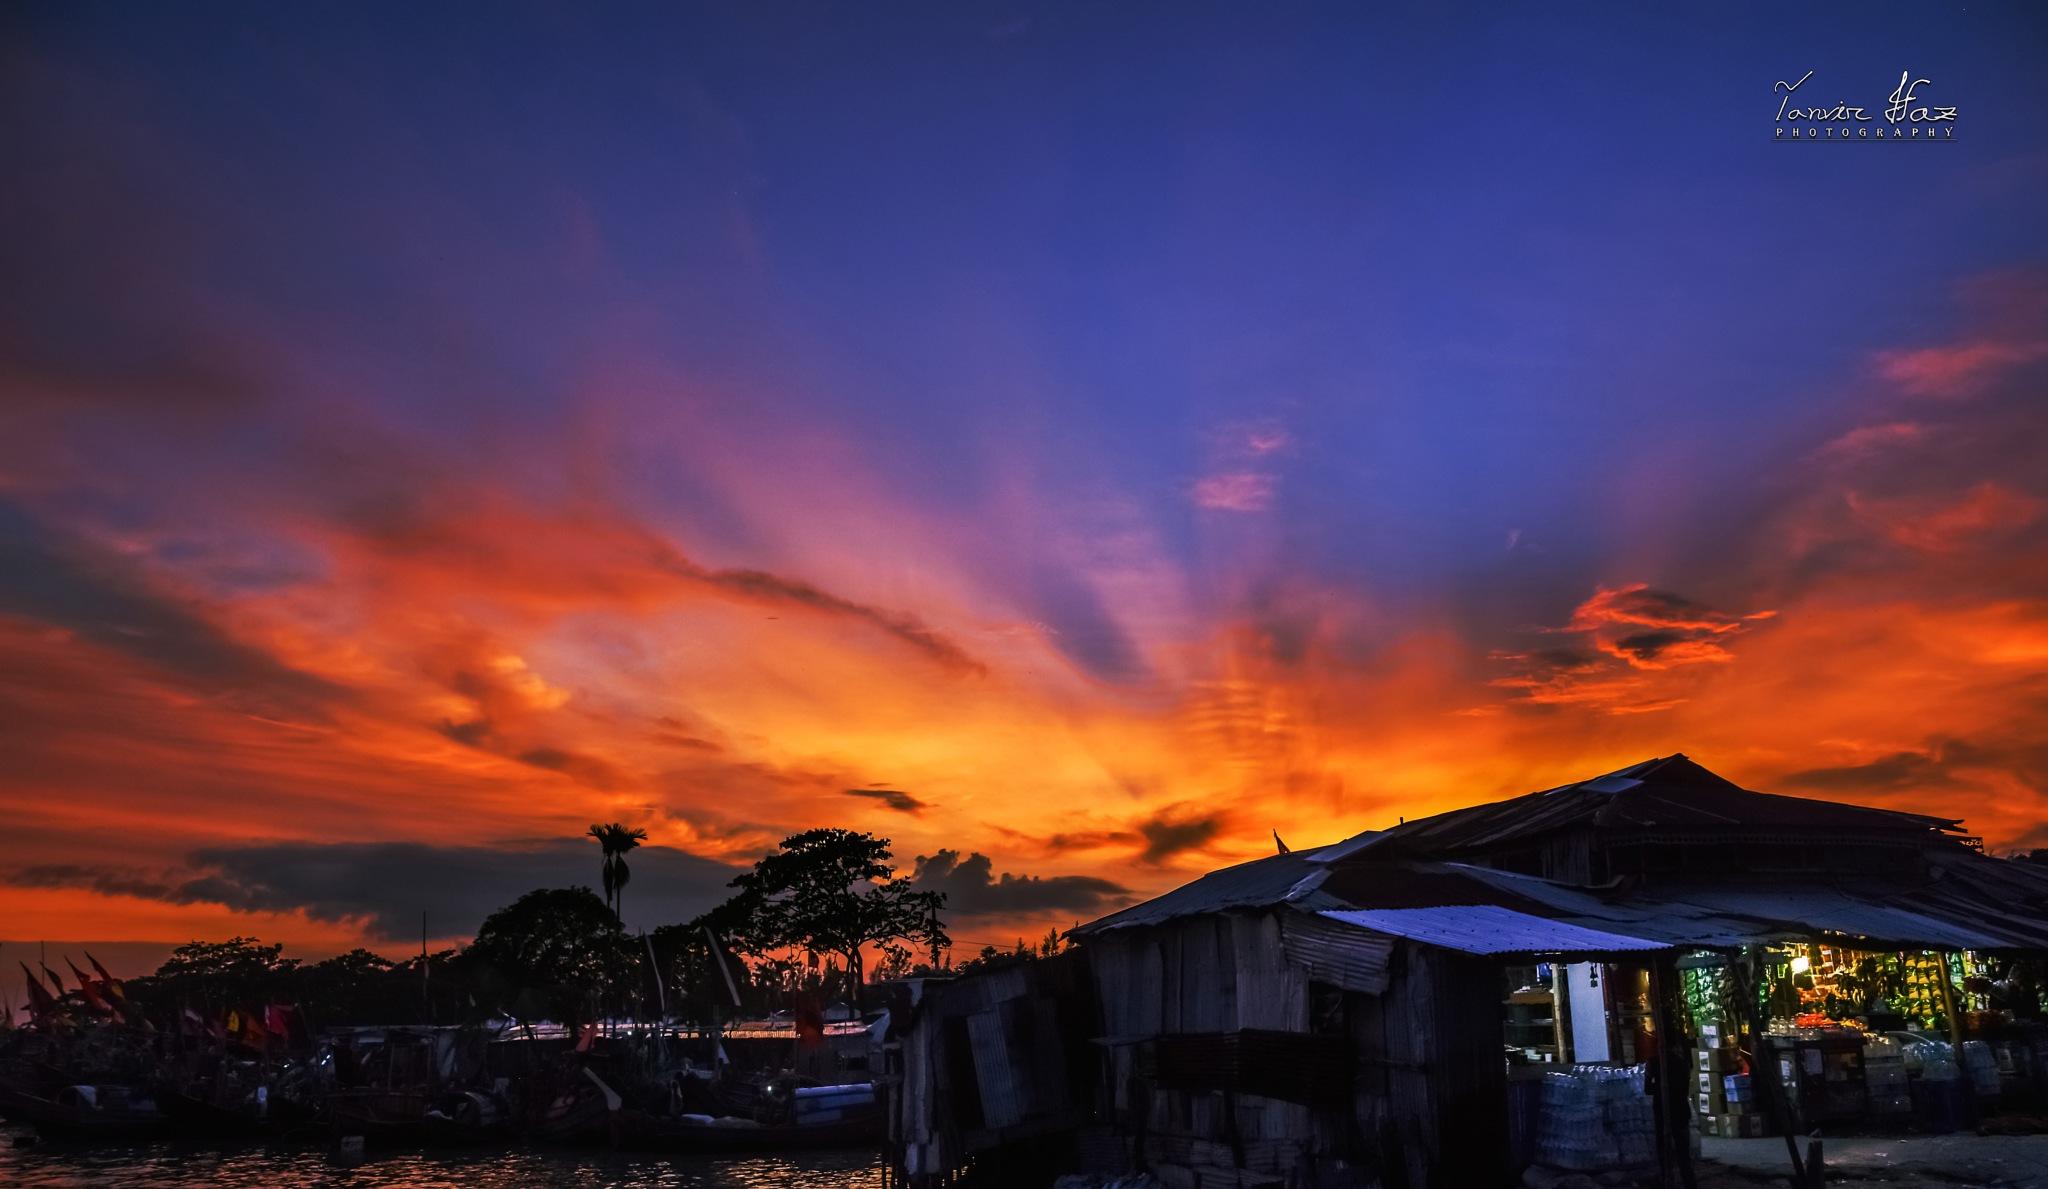 Fallen Evening. by Tanvir IFAZ